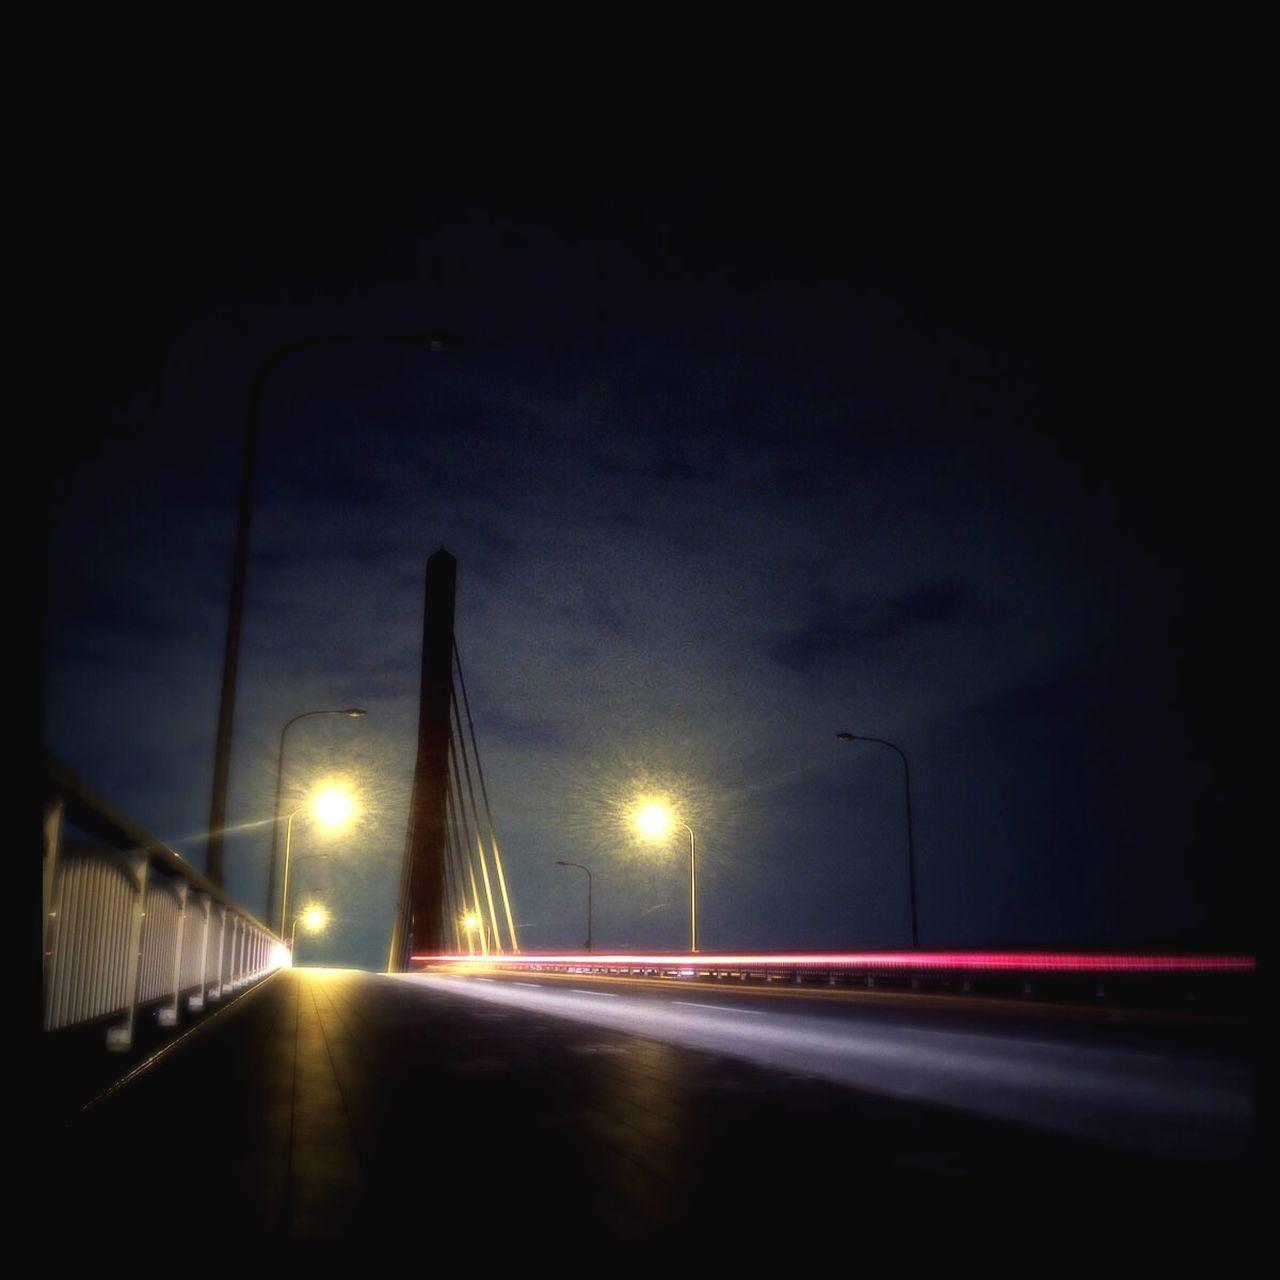 Long Exposure Street Nightscapes Okinawa 海中道路 沖縄 うるま市